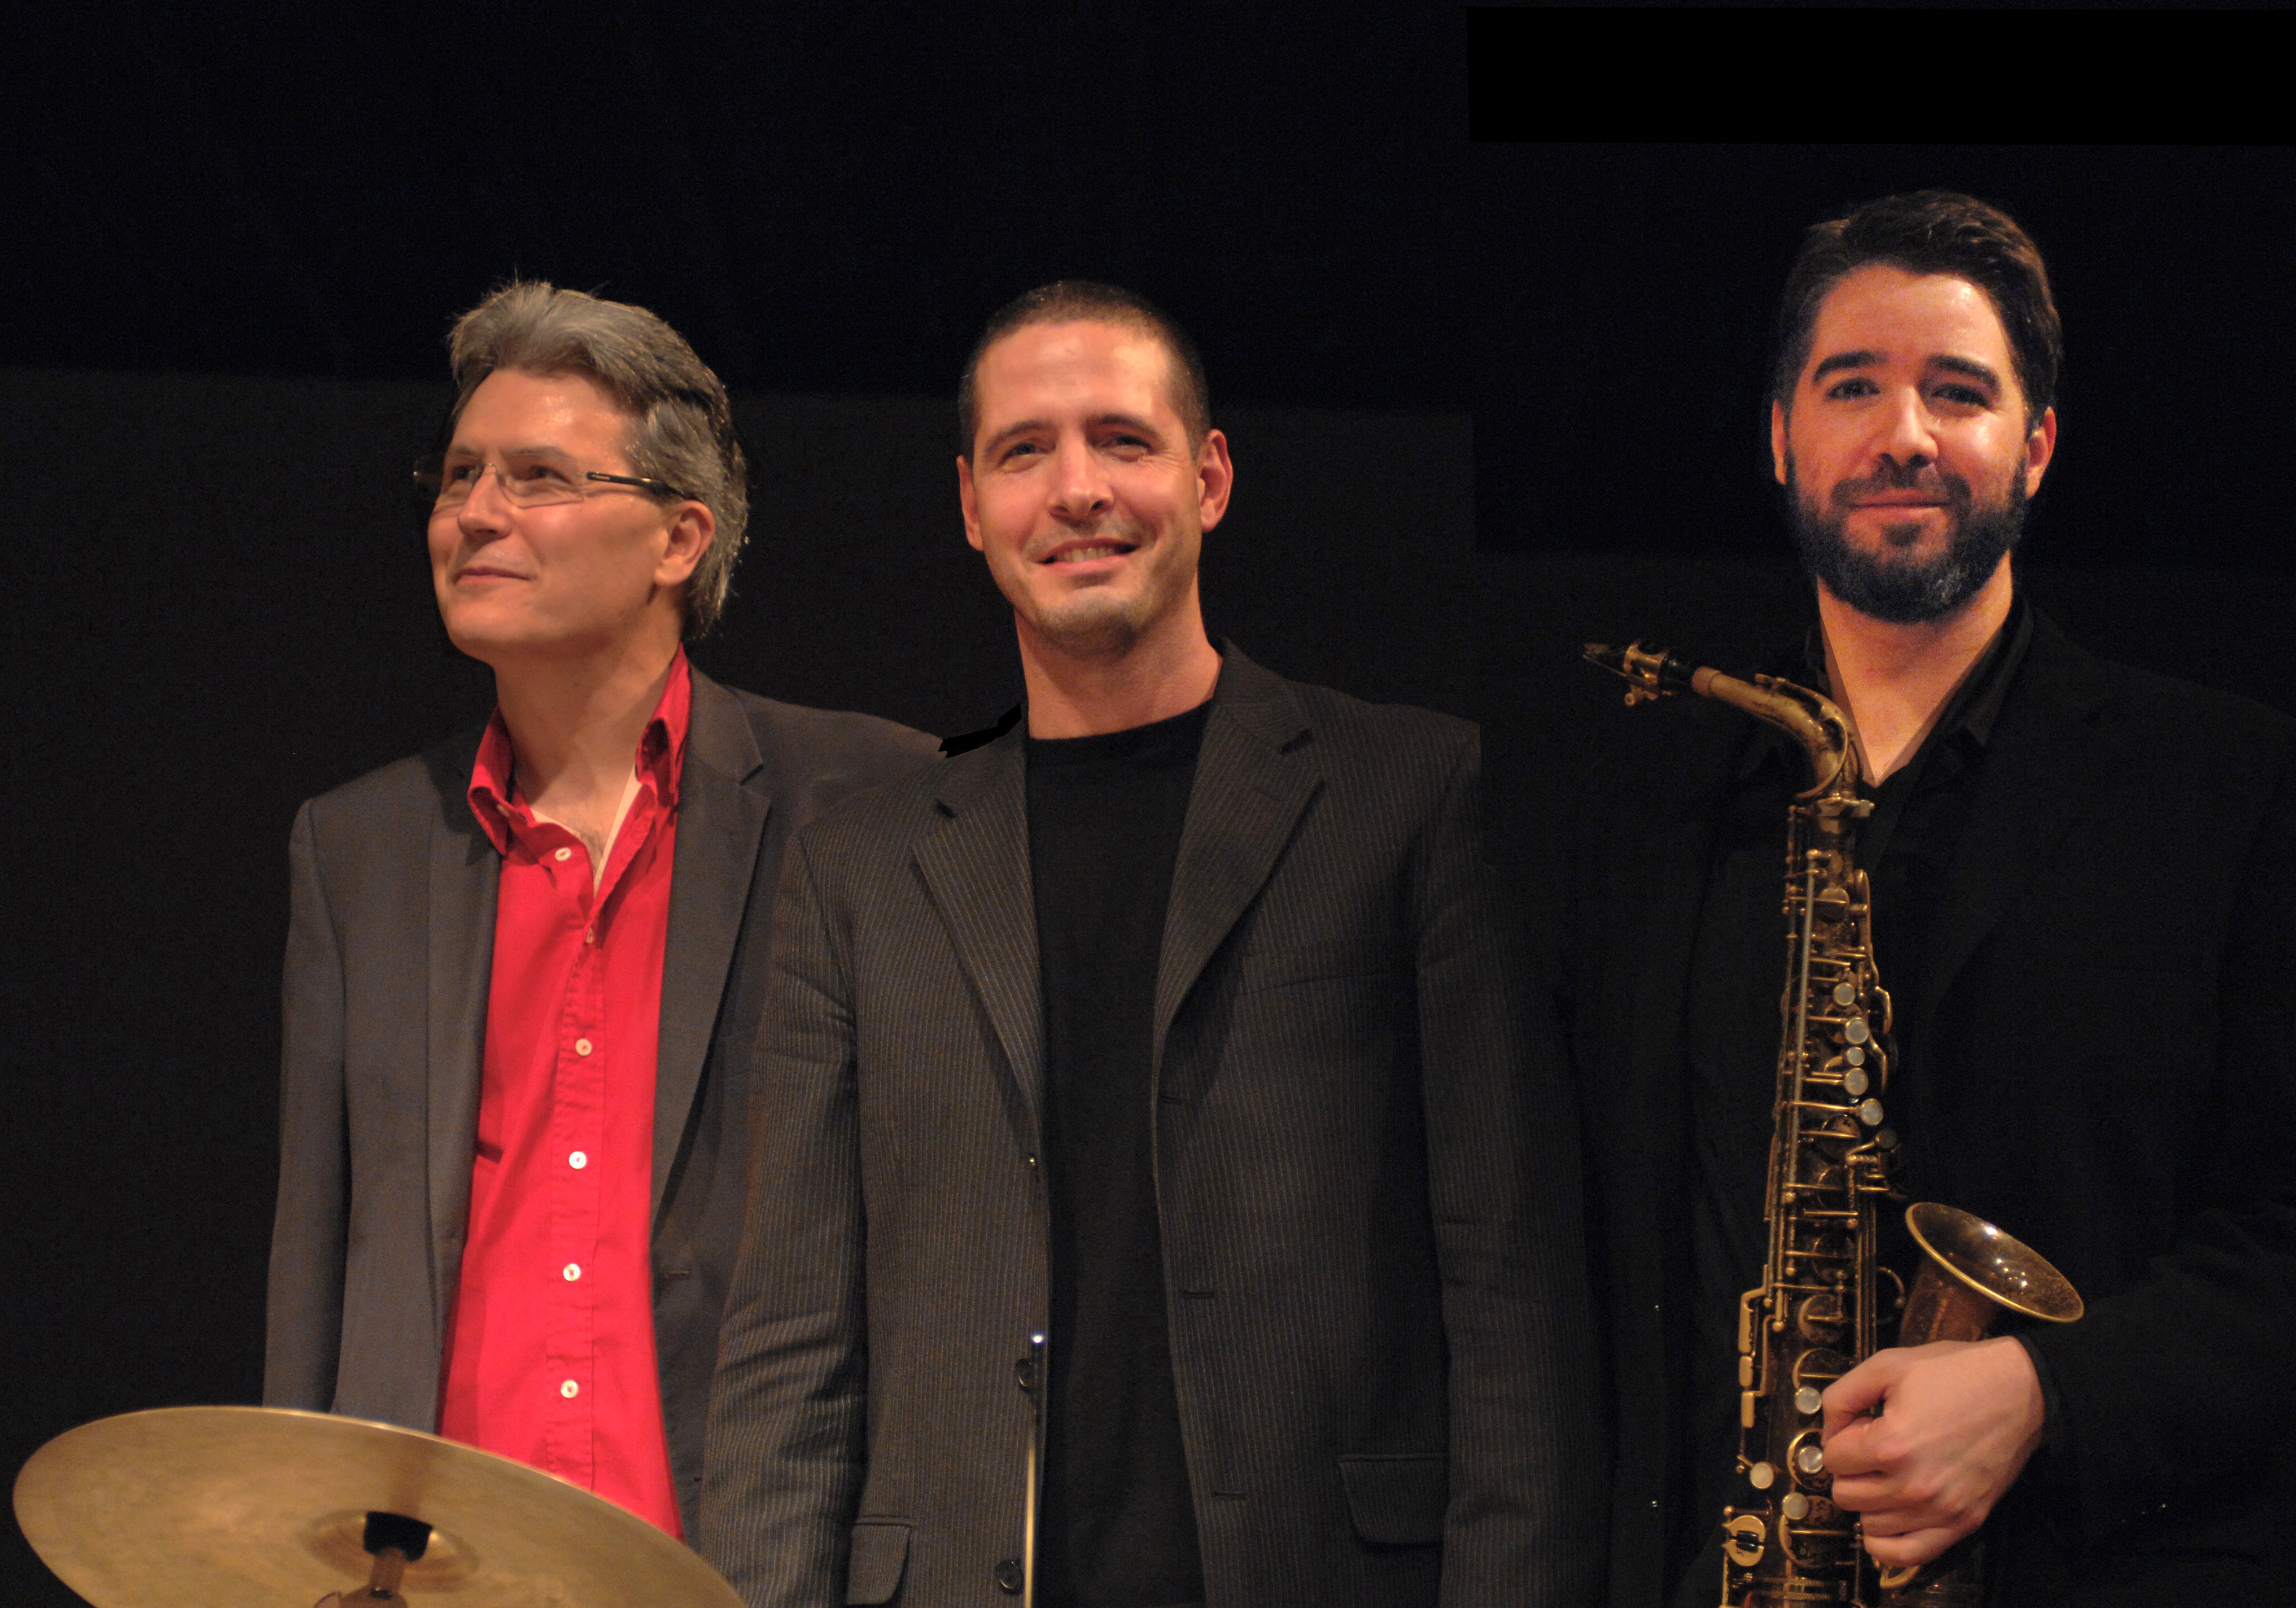 John Goldsby, Jason Tiemann, Jacob Duncan